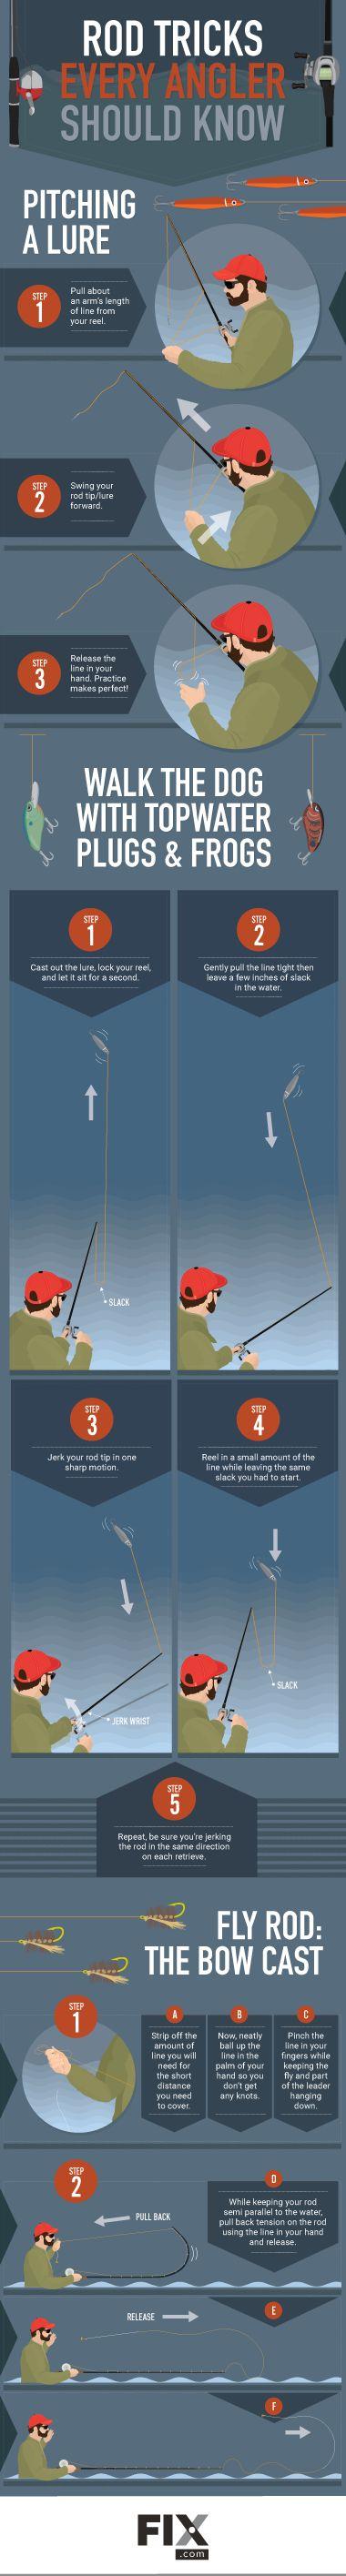 Fishing Rod Tricks For Tight Casts | Fix.com